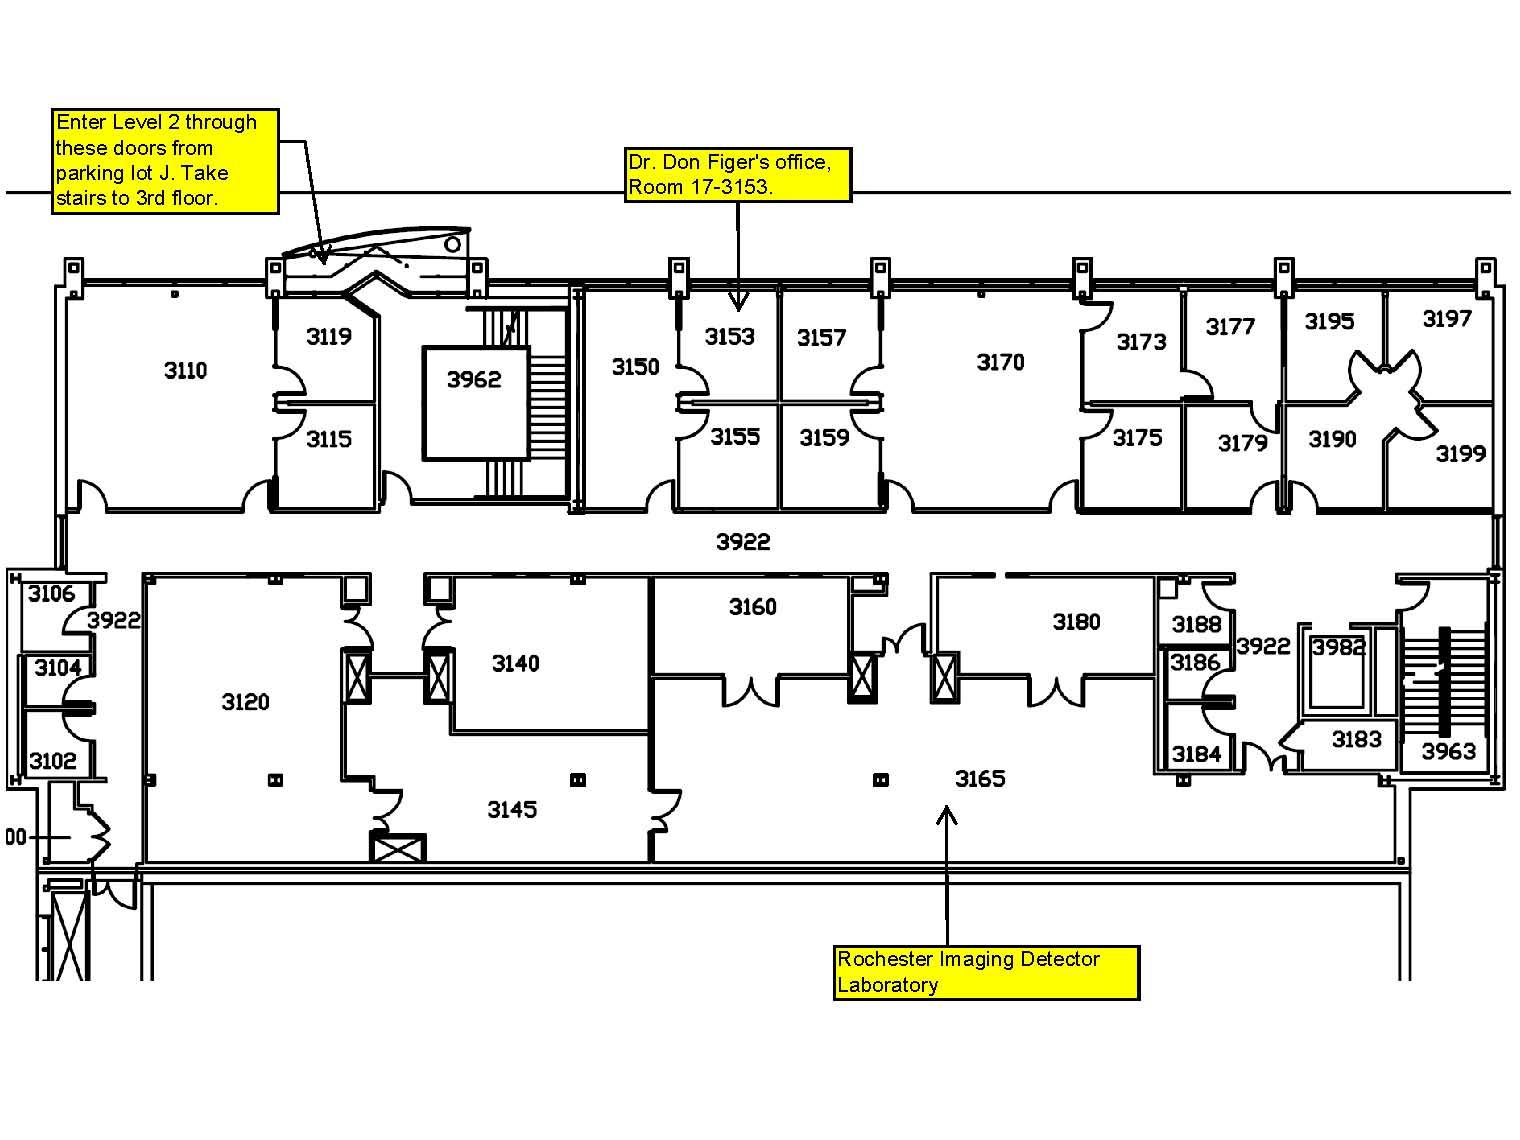 Rit Residence Halls Floor Plans Carpet Vidalondon